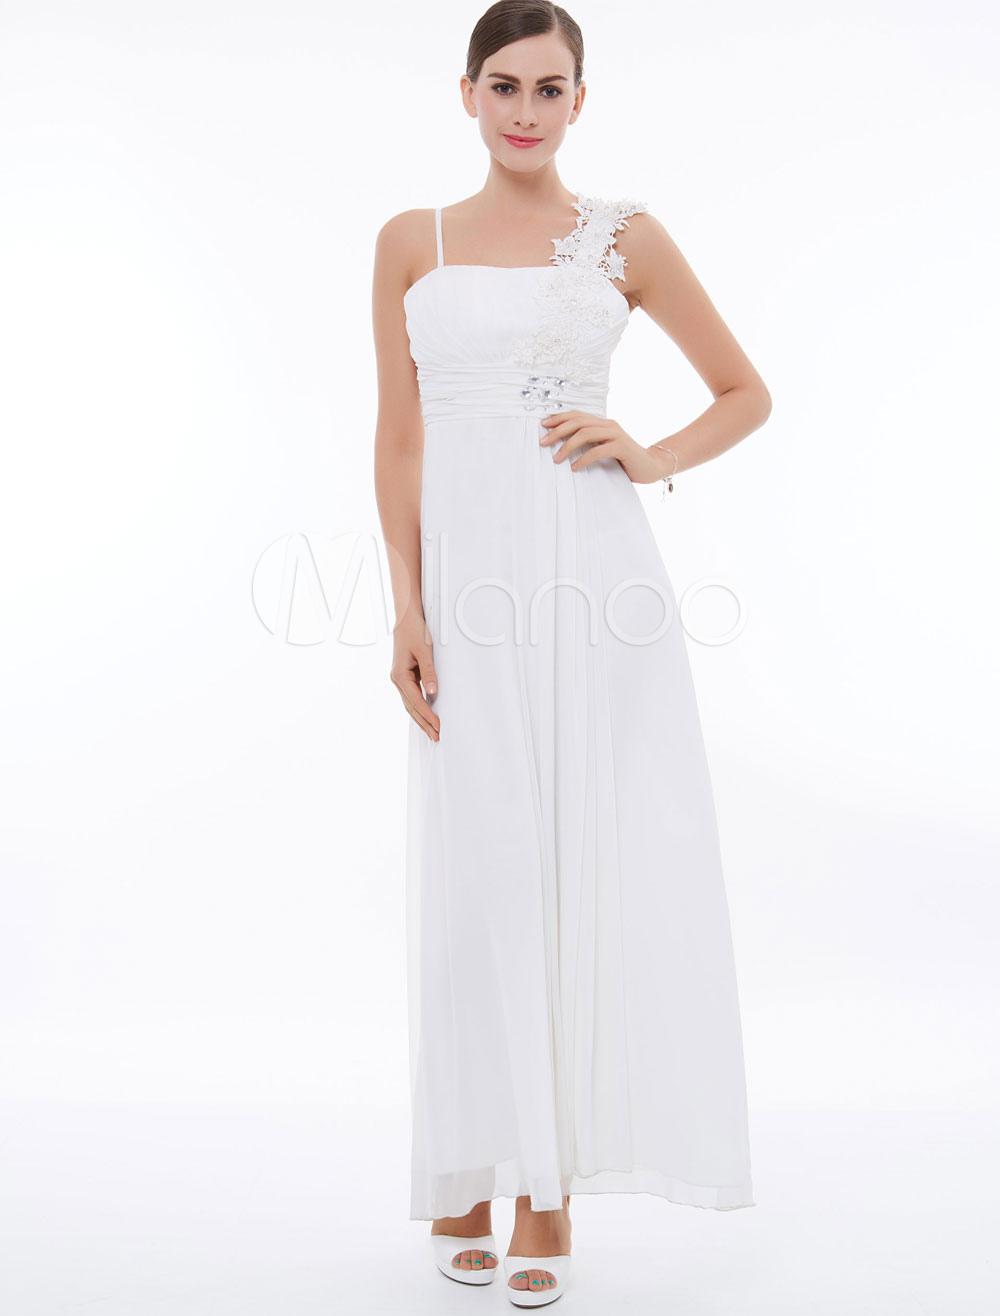 4470318d68ca White Bridesmaid Dresses Long | Saddha